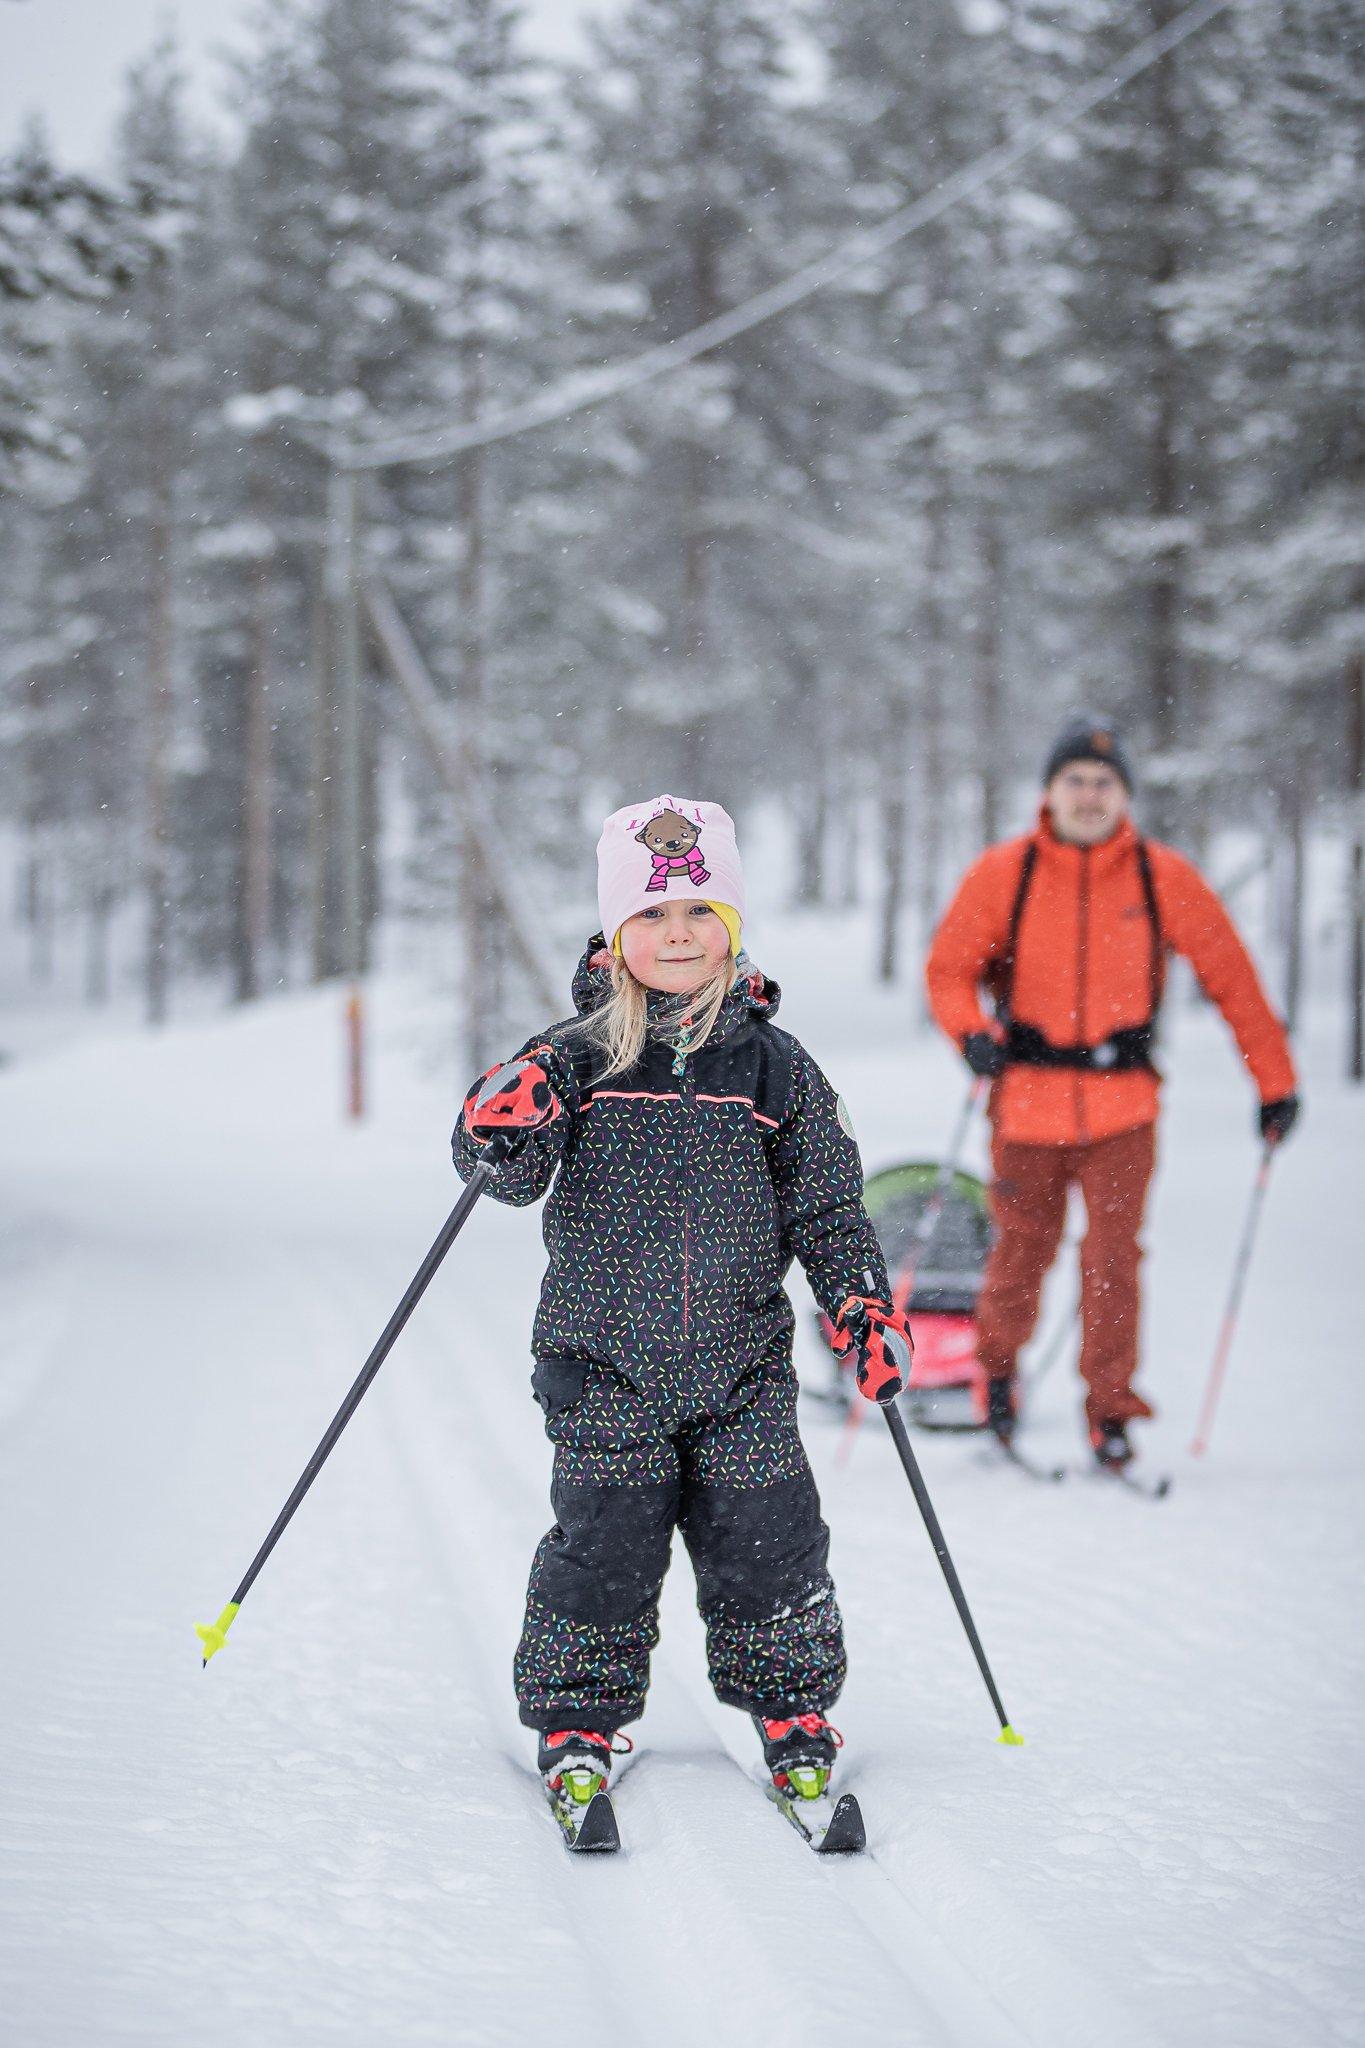 Levi_Ski_Resort_2020_Winte-aktiviteetit